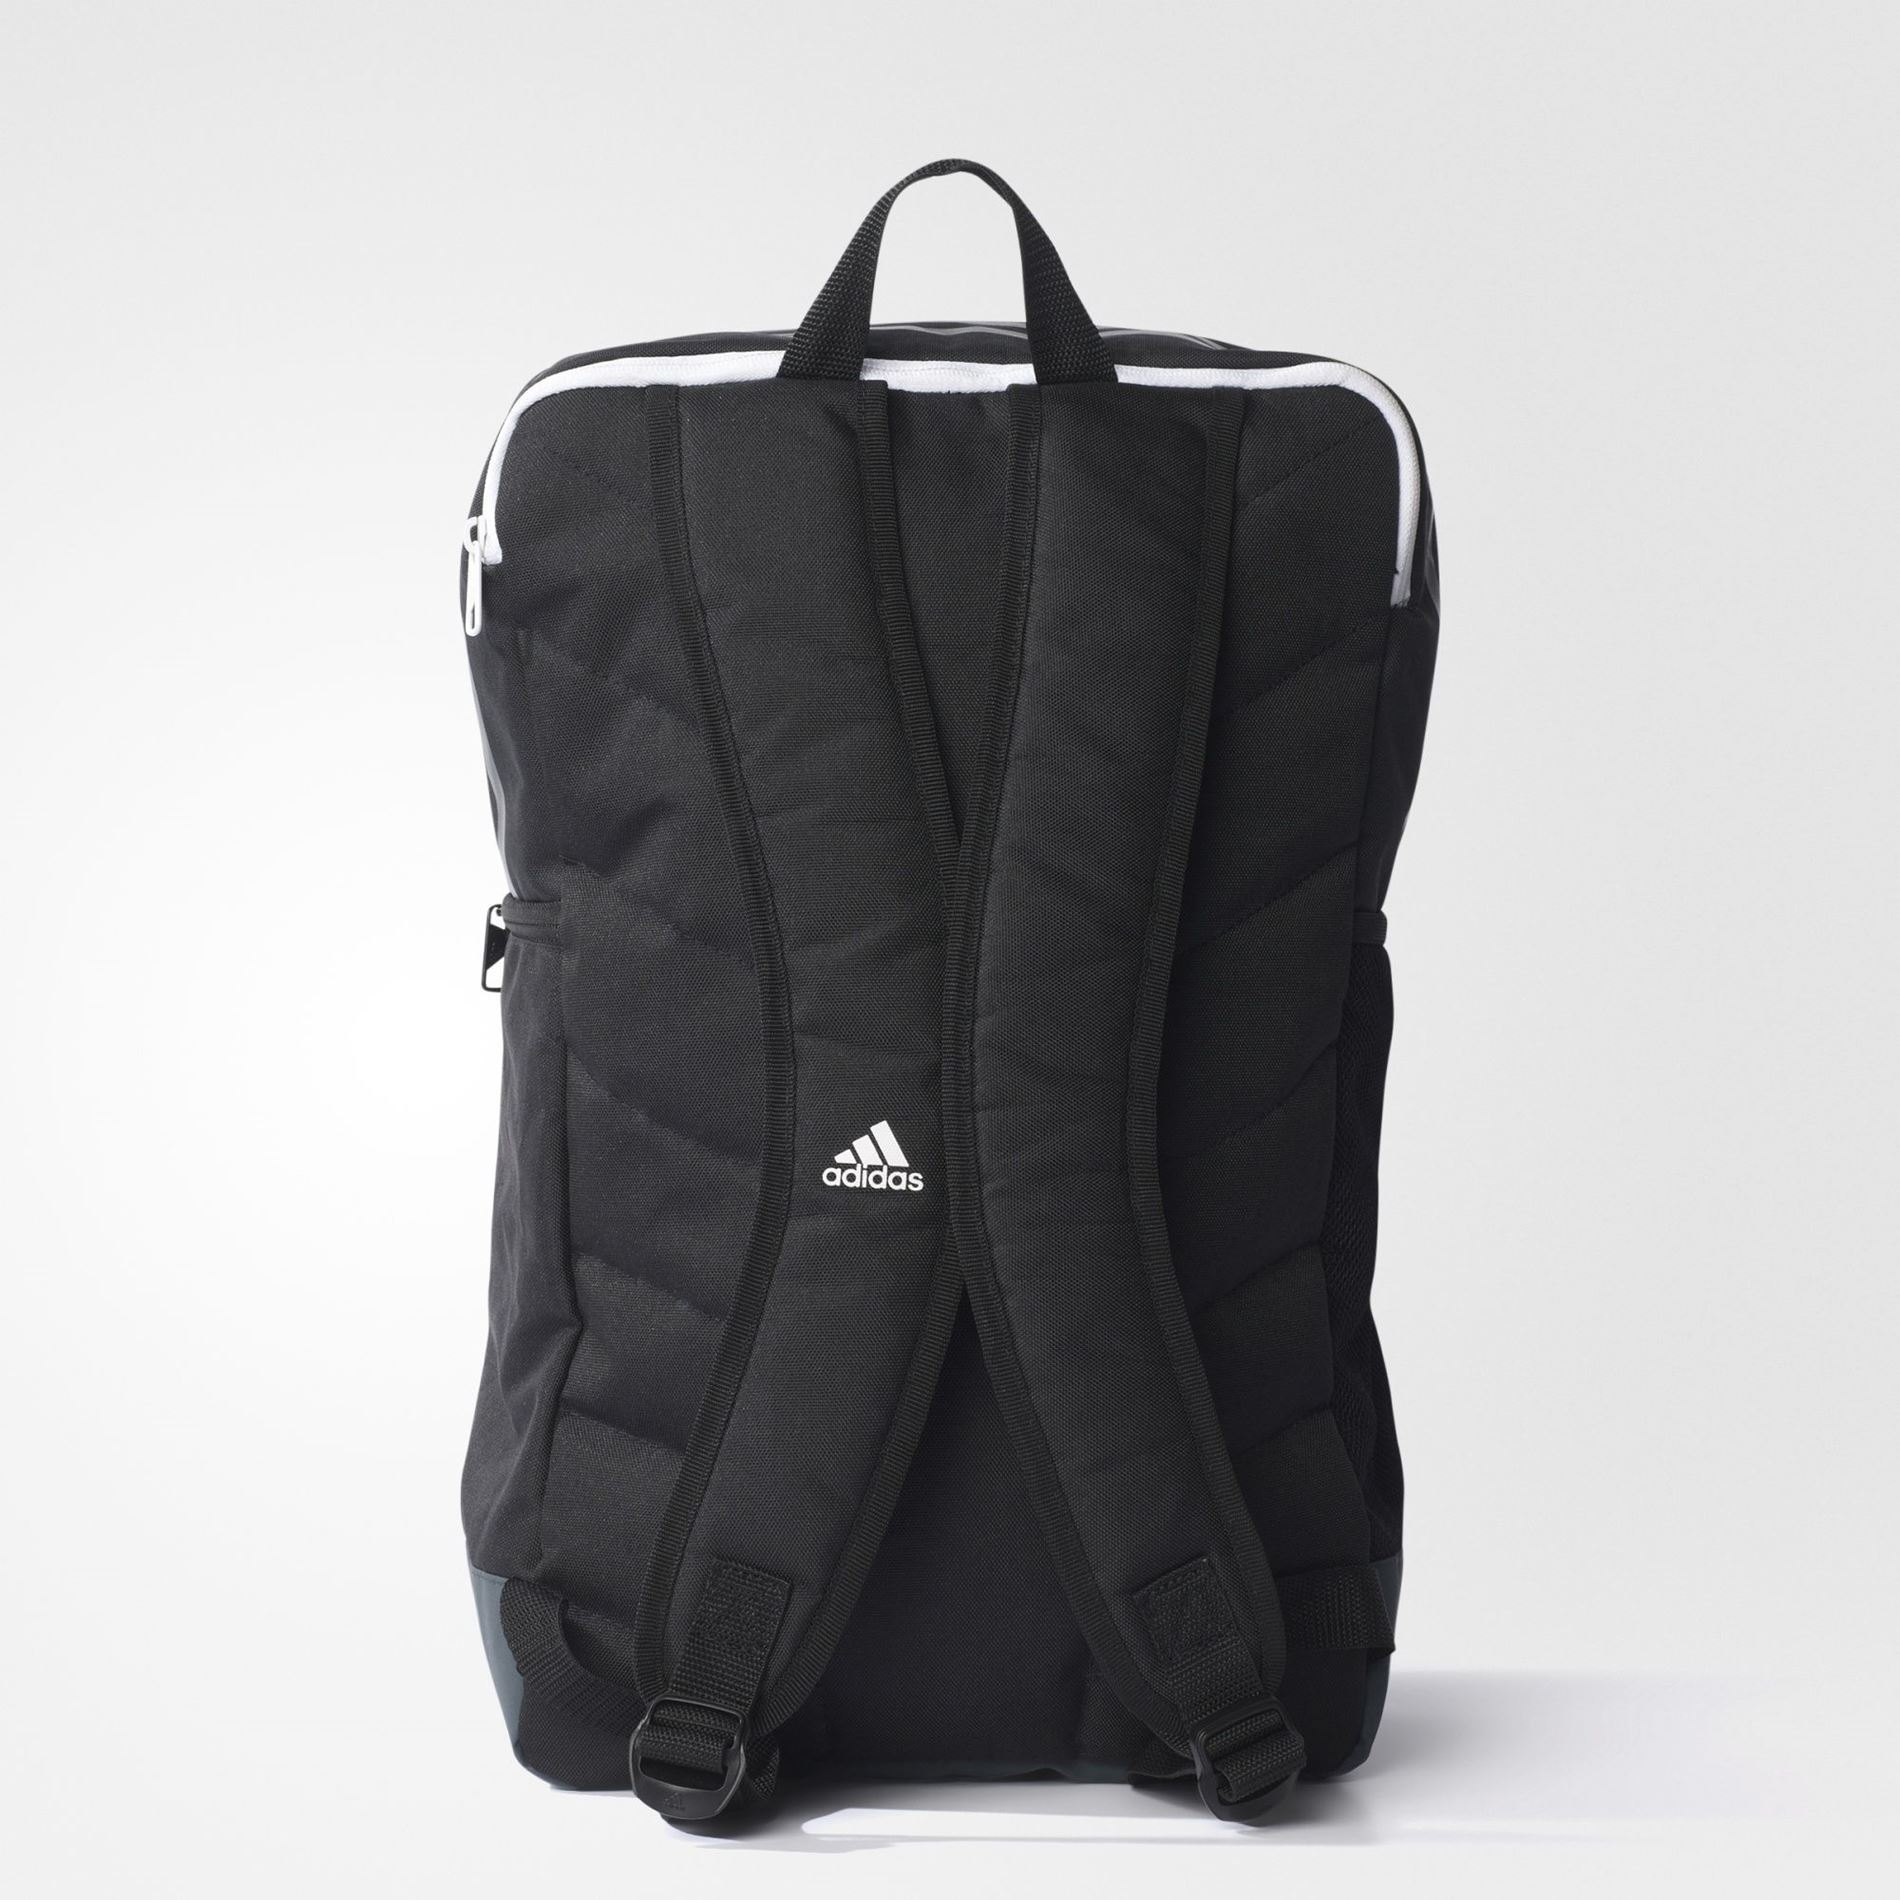 ef81eb77 Adidas Tiro17 Ryggsekk Svart Utleira- Fotballsko.no - Sko fra Adidas, Nike  og Puma. Nor-Contact Sport